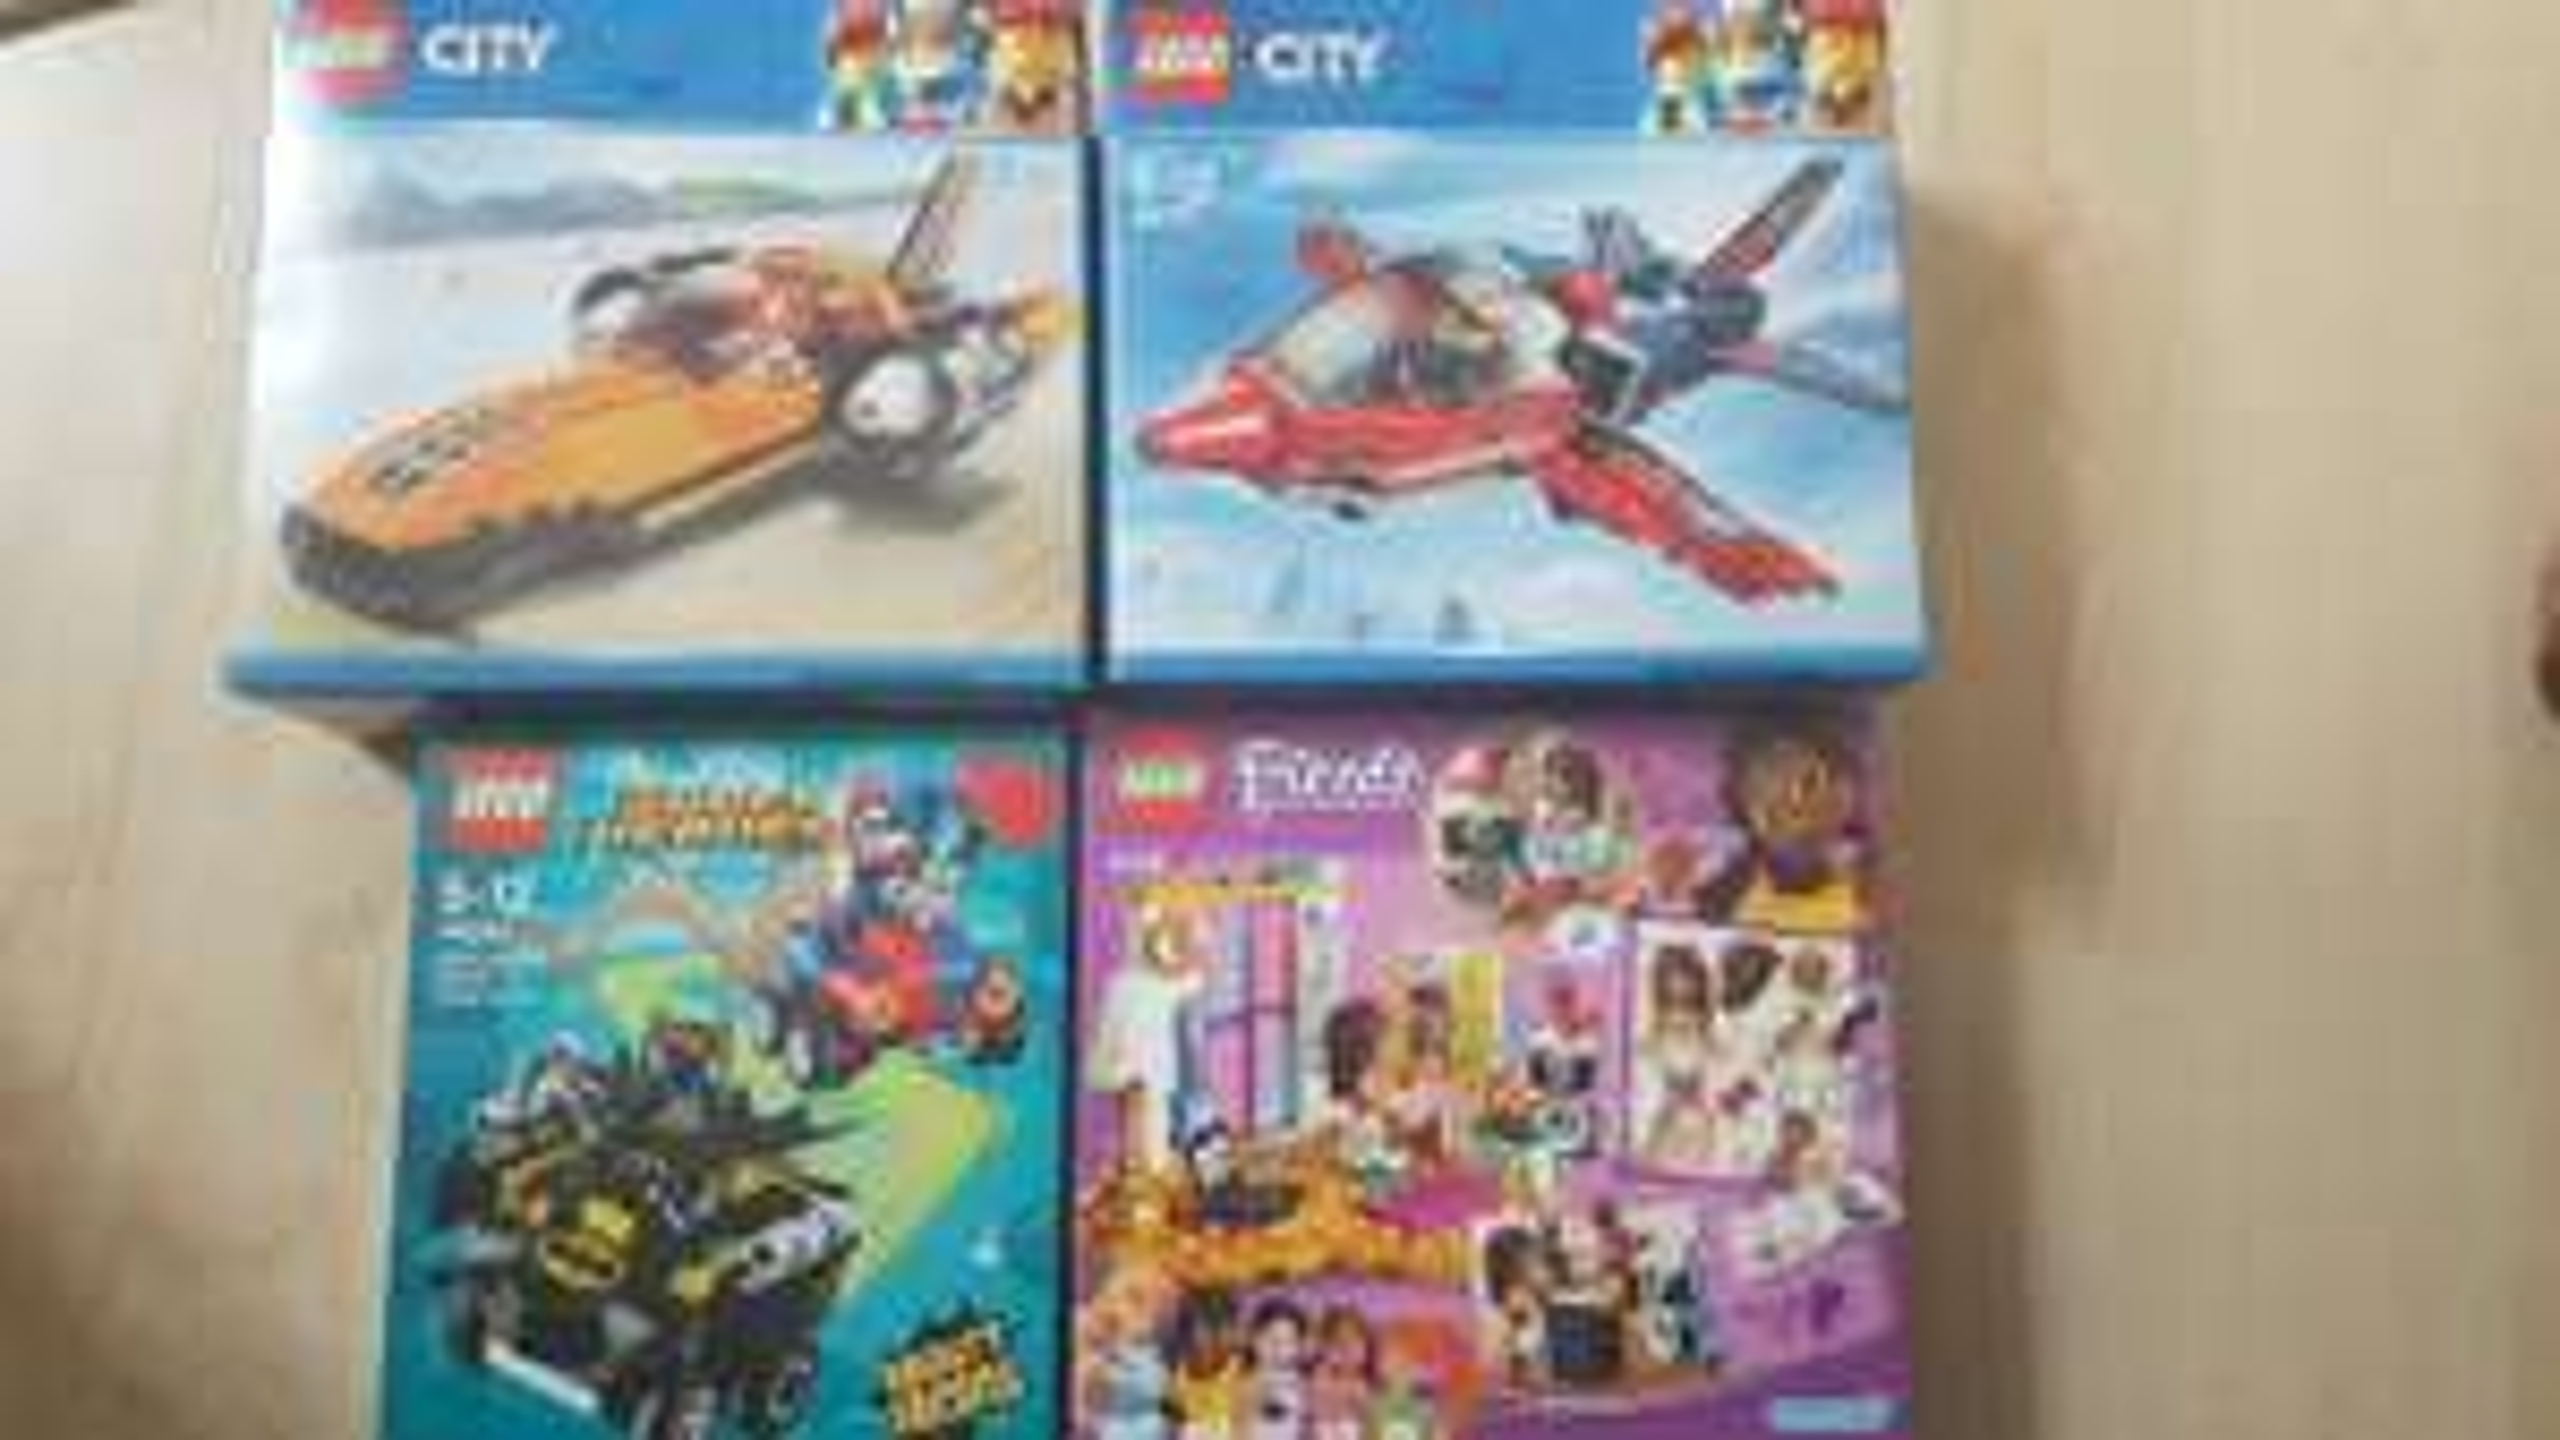 Various lego sets - 60177, 41341, 76092, 60178 scanning at £2.50/£3.50 sainsburys instore